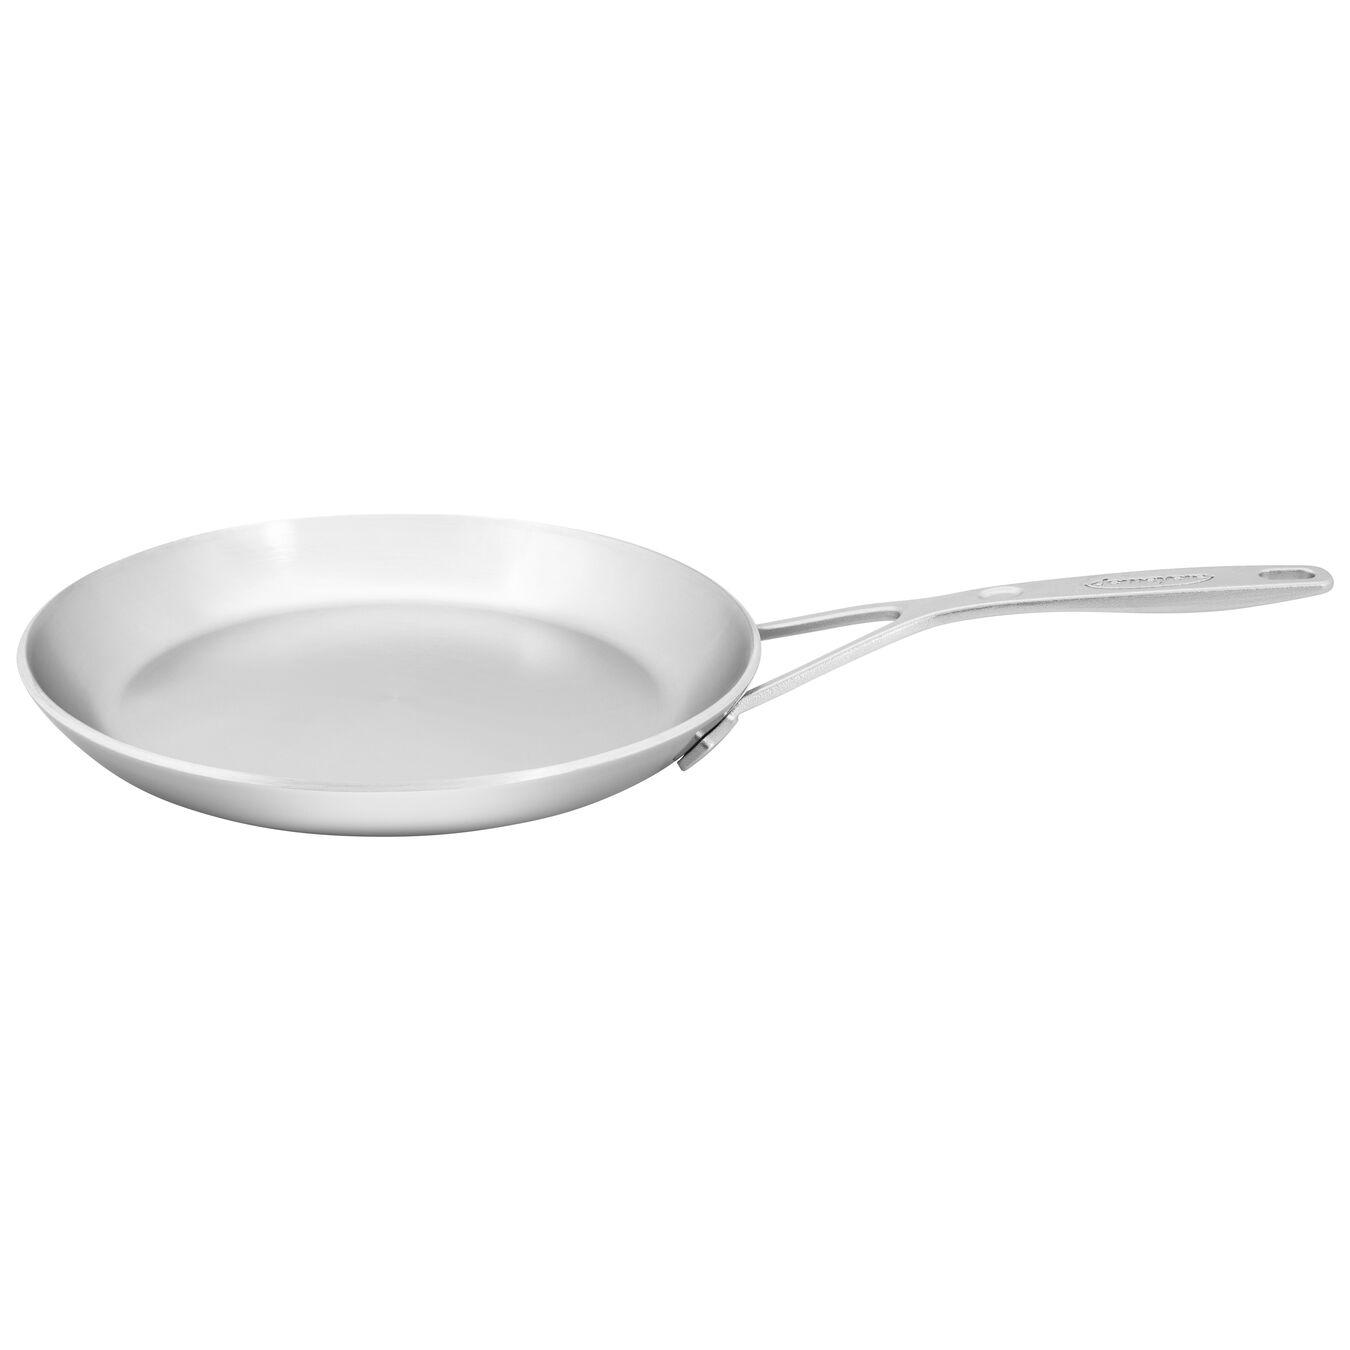 Crêpes-Pfanne 26 cm, 18/10 Edelstahl, Silber,,large 2